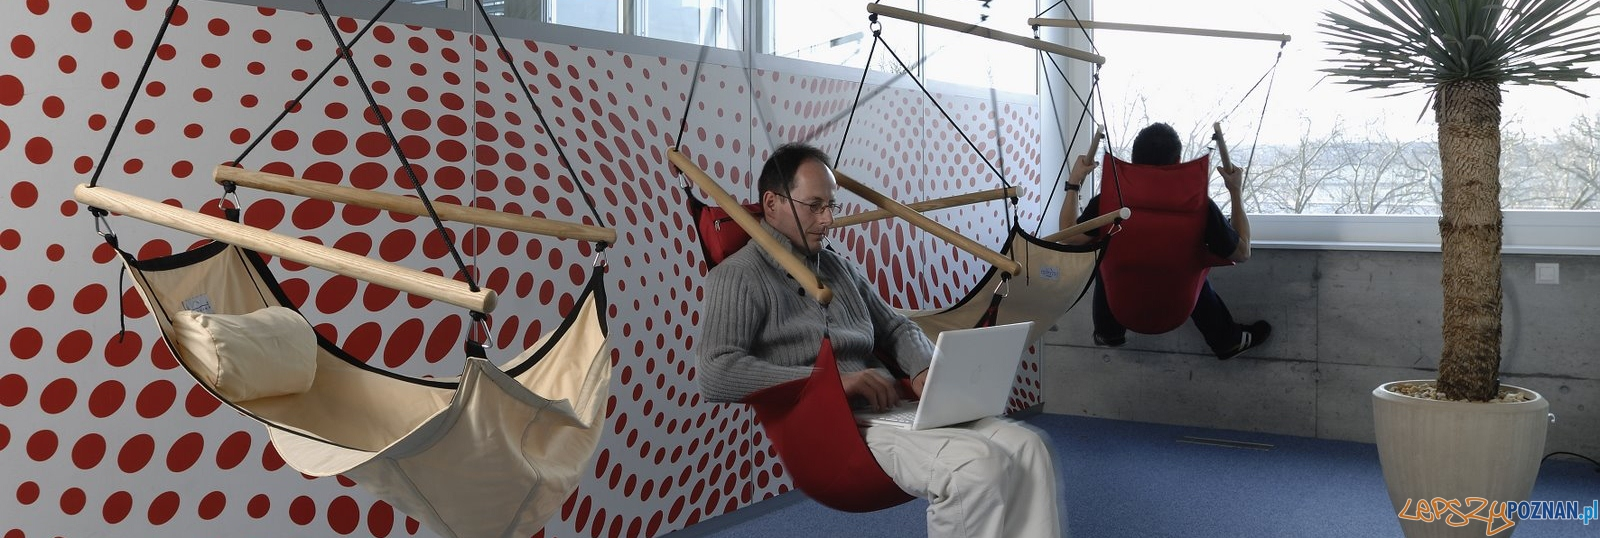 Nietypowe biuro Google'a w Zurichu  Foto: Google